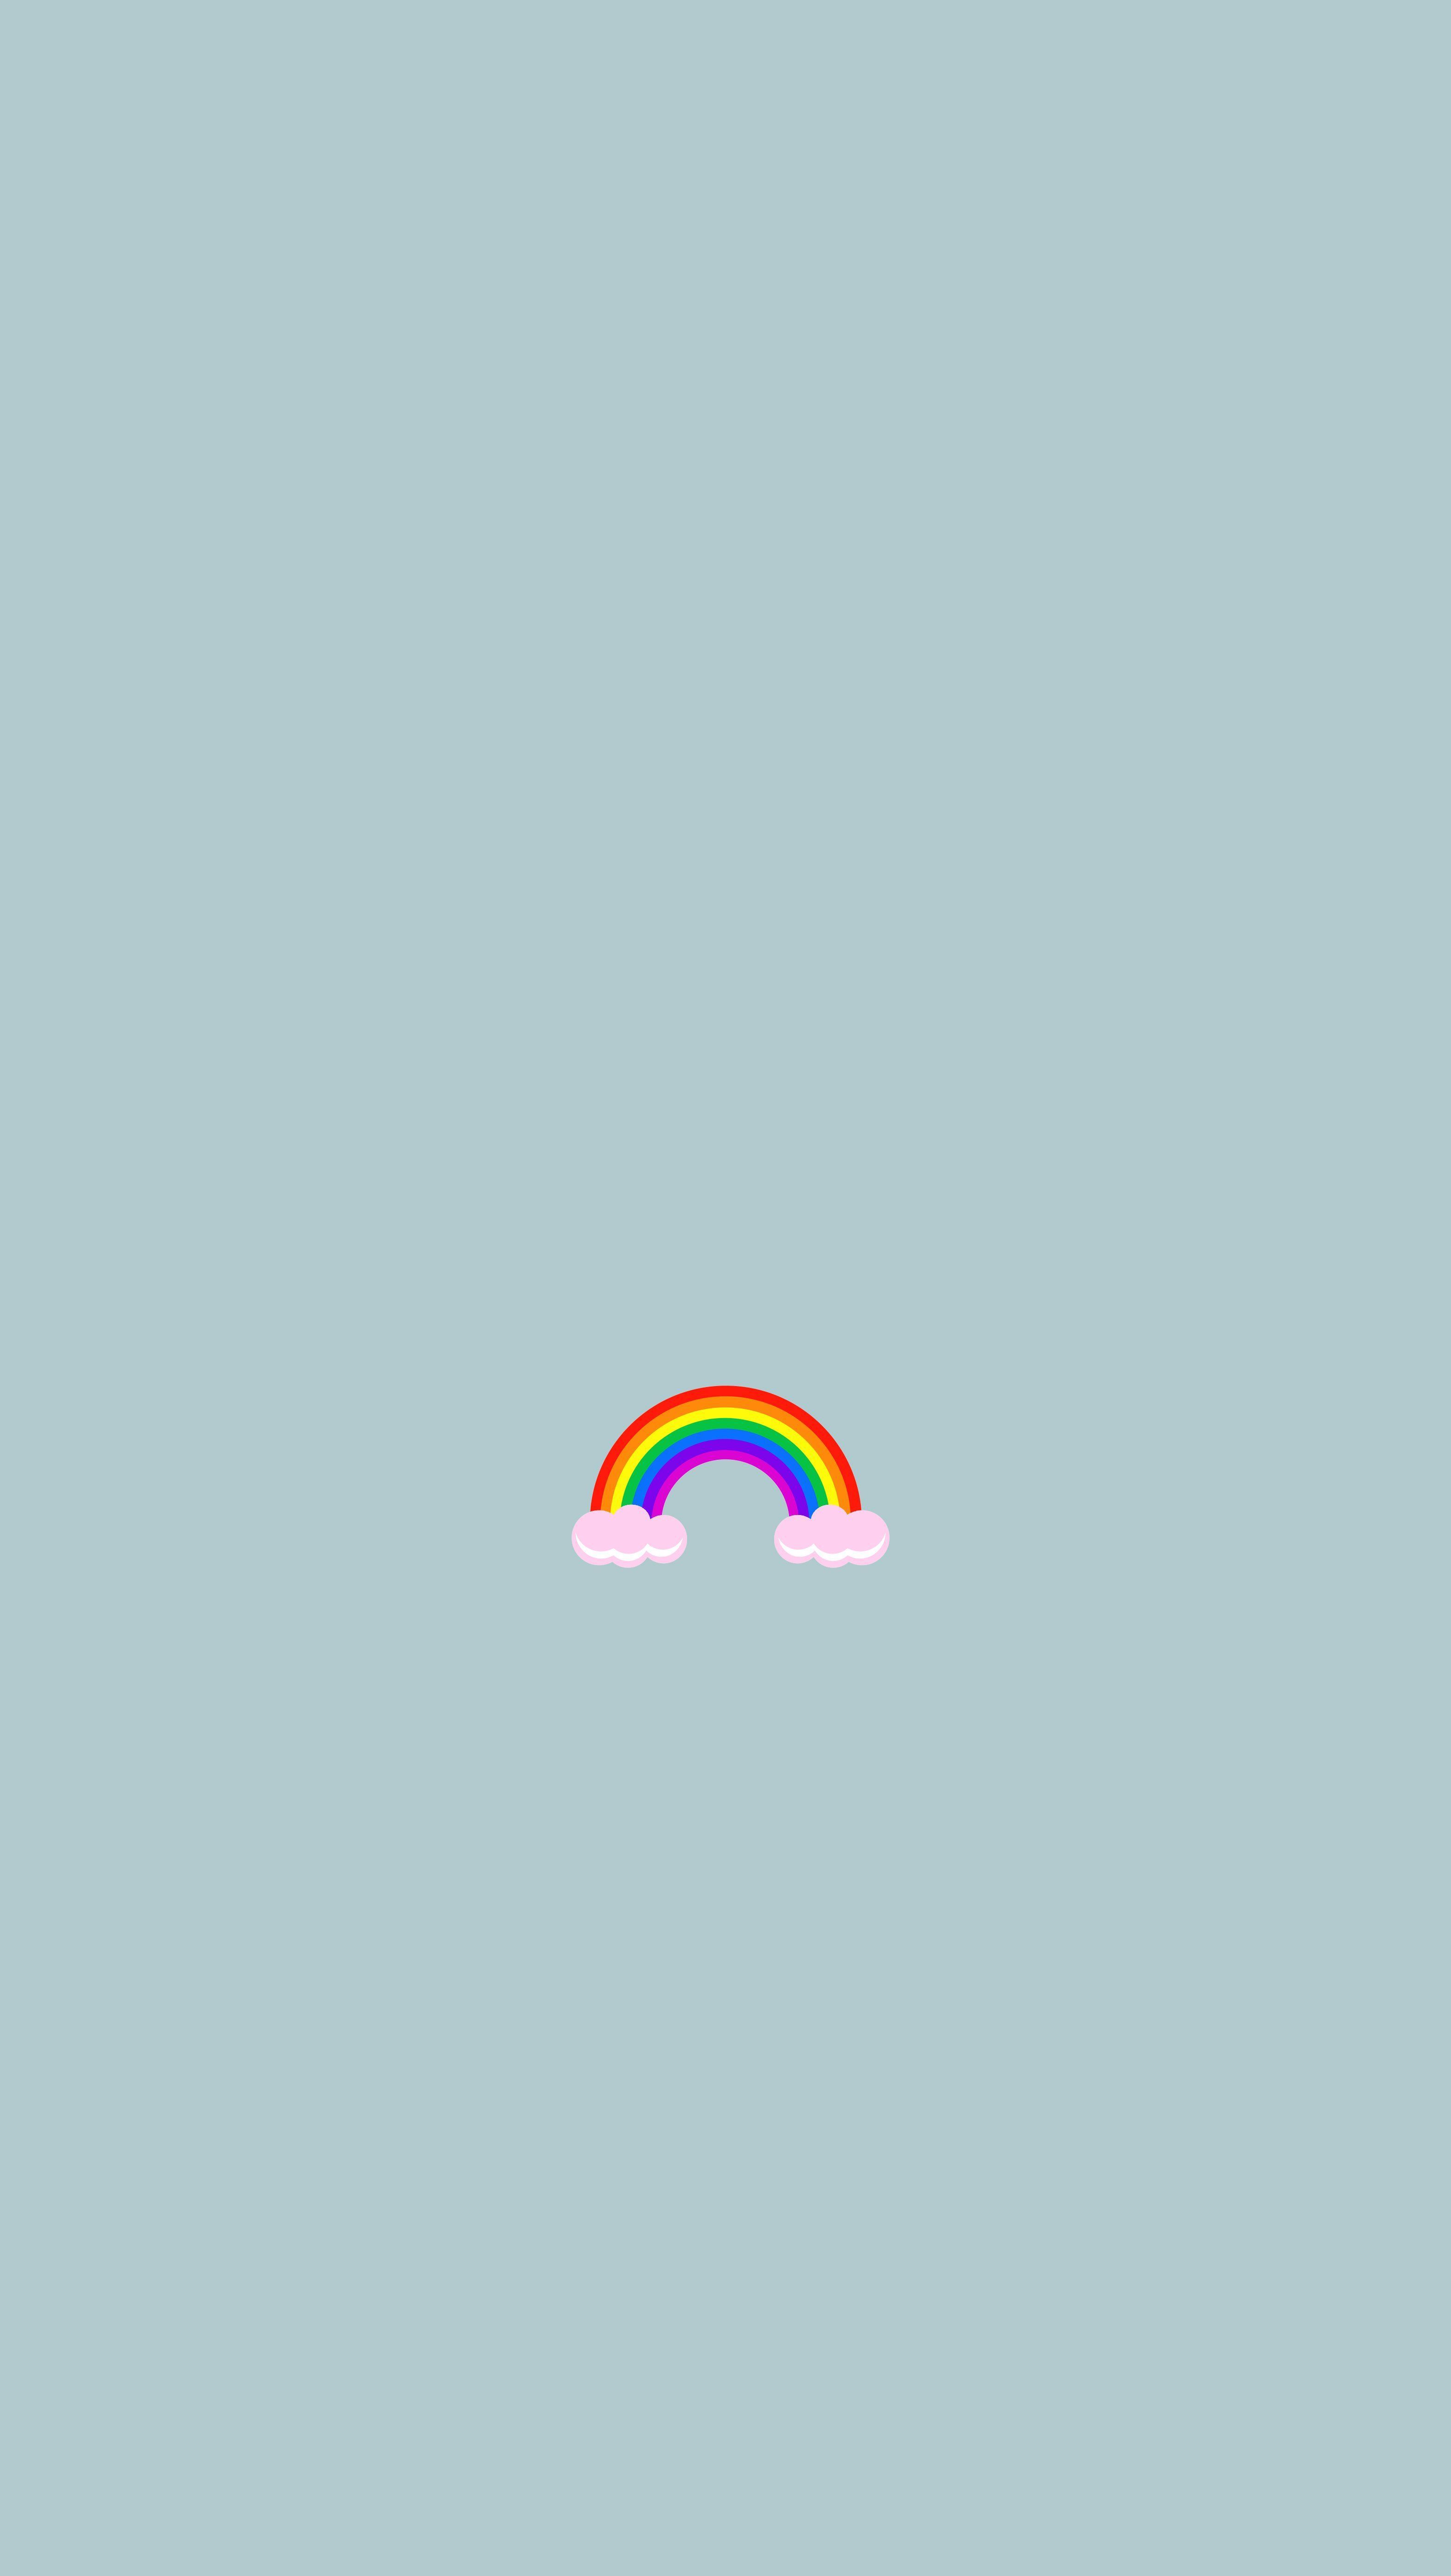 Arvo | Be good, Do good.    @arvowear #arvowear #arvo #rainbow #rainbows #rainbowhair #rainbowcake #colors #colorful #coloring #begooddogood #arvobegooddogood #lightning #thunderbolt